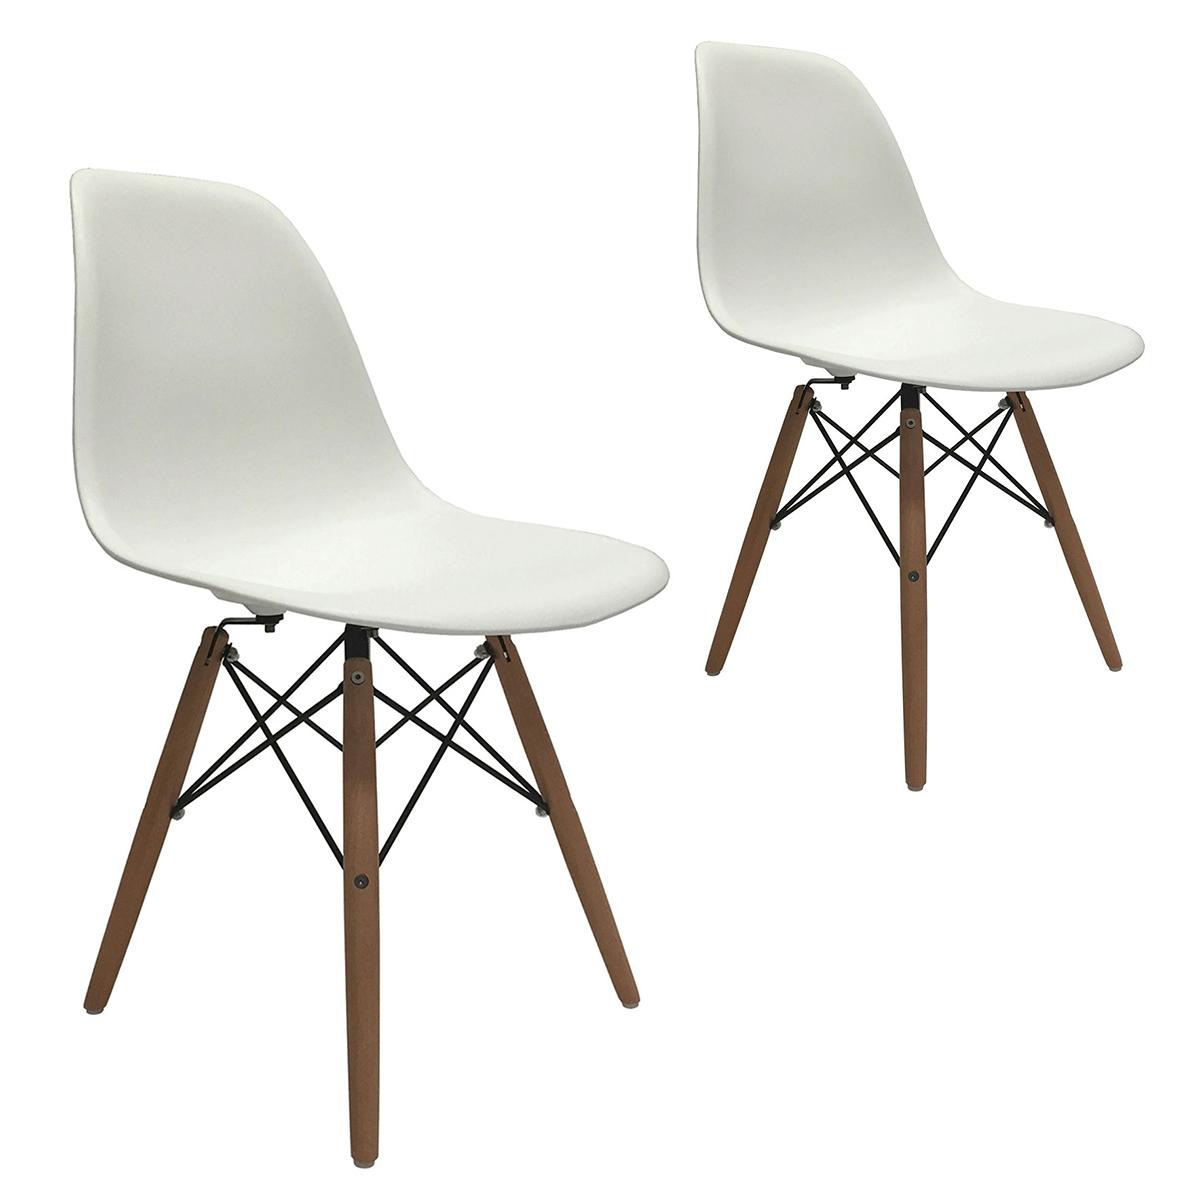 eames molded wood side chair henriksdal dining covers ikea set of 2 dsw eiffel dowel leg